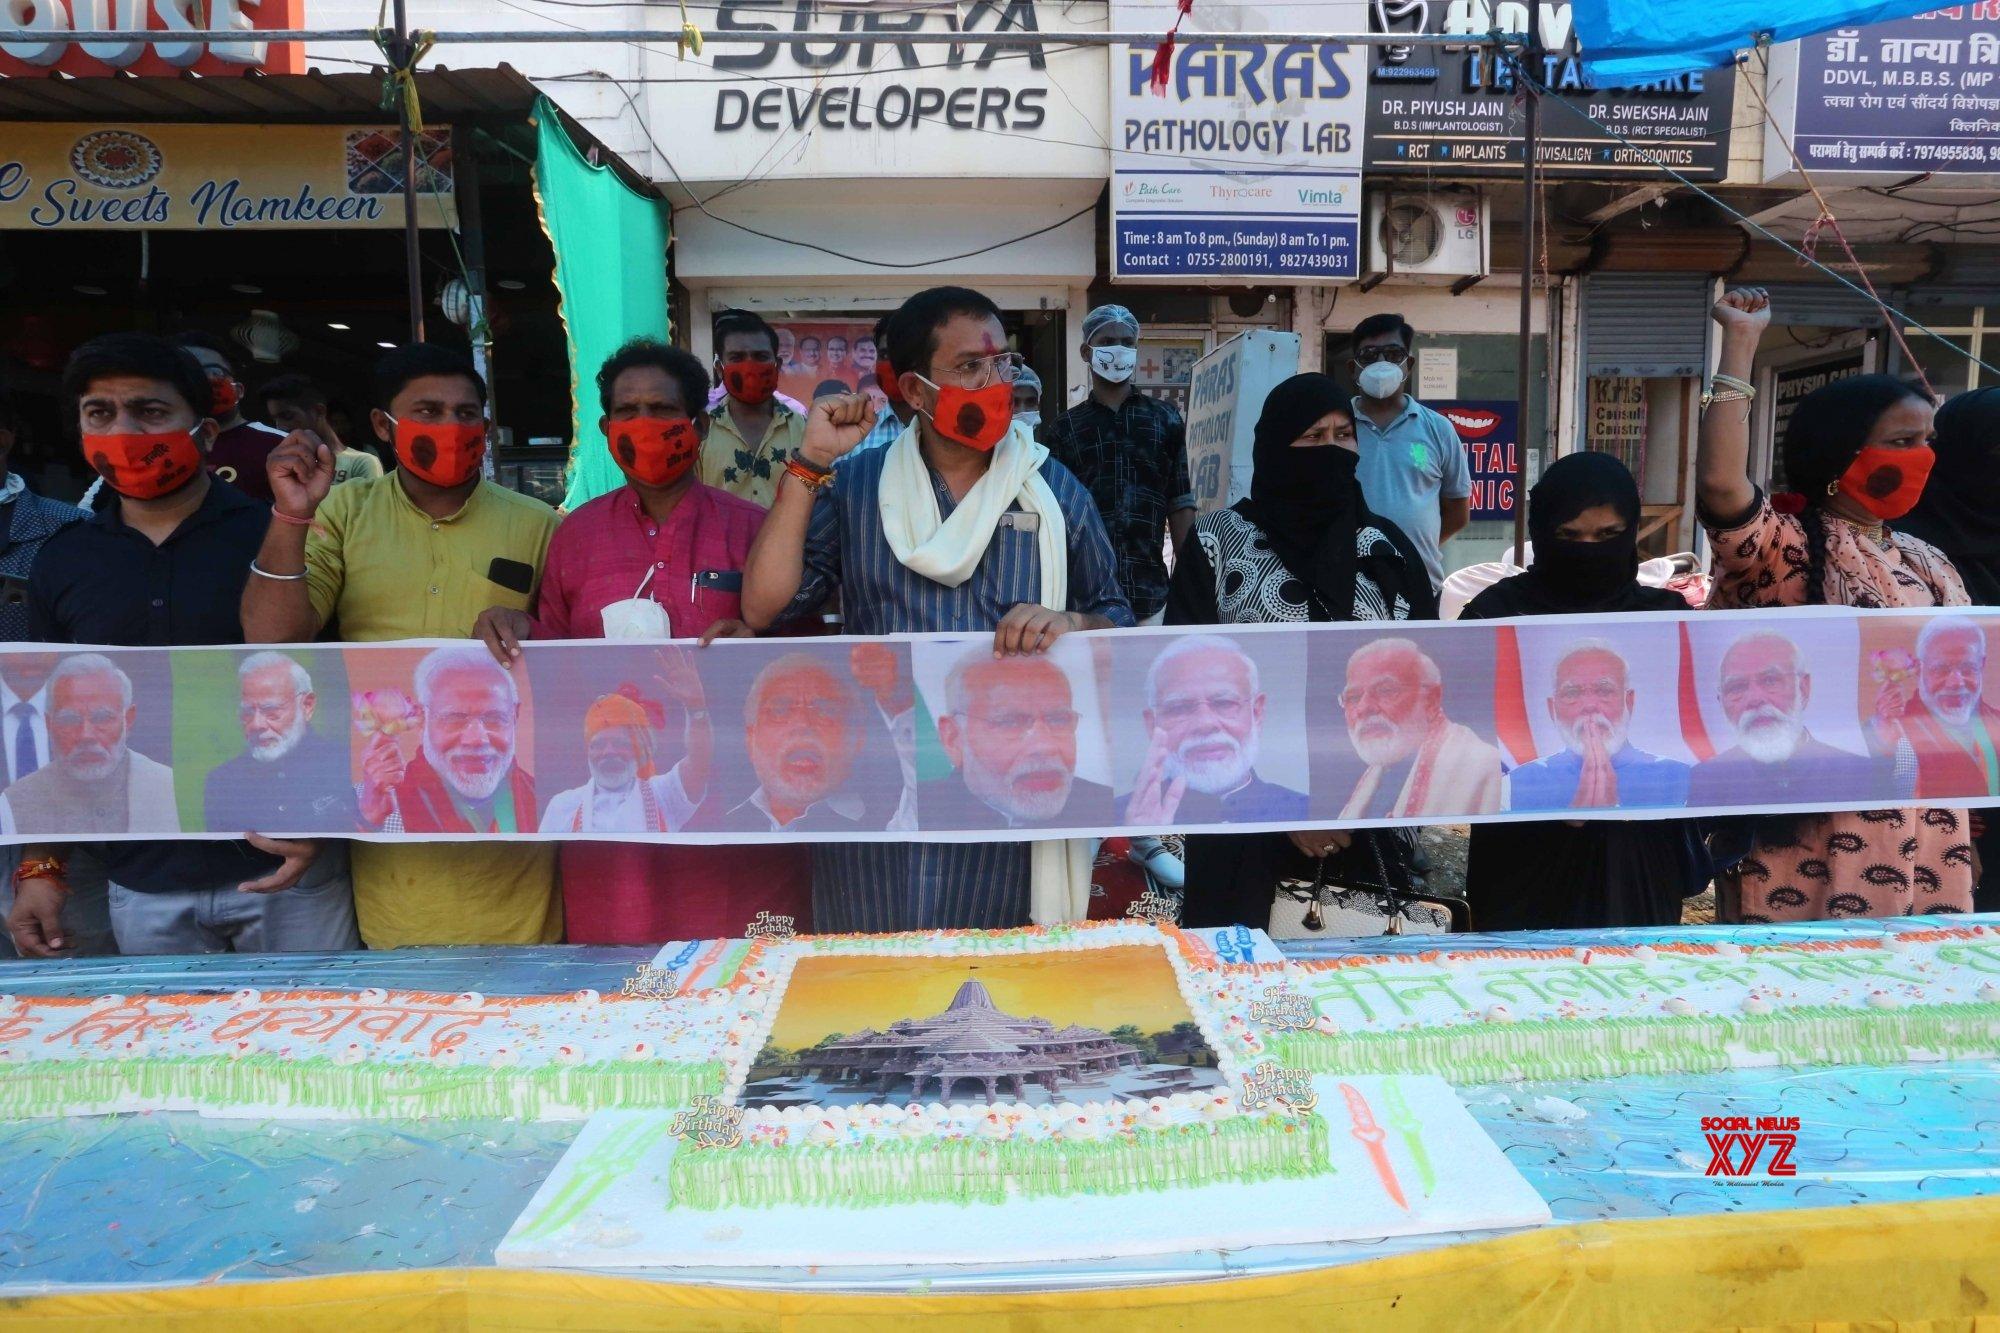 Bhopal: Bharatiya Sindhu Sabha activists cut cake on PM Modi's b'day eve #Gallery